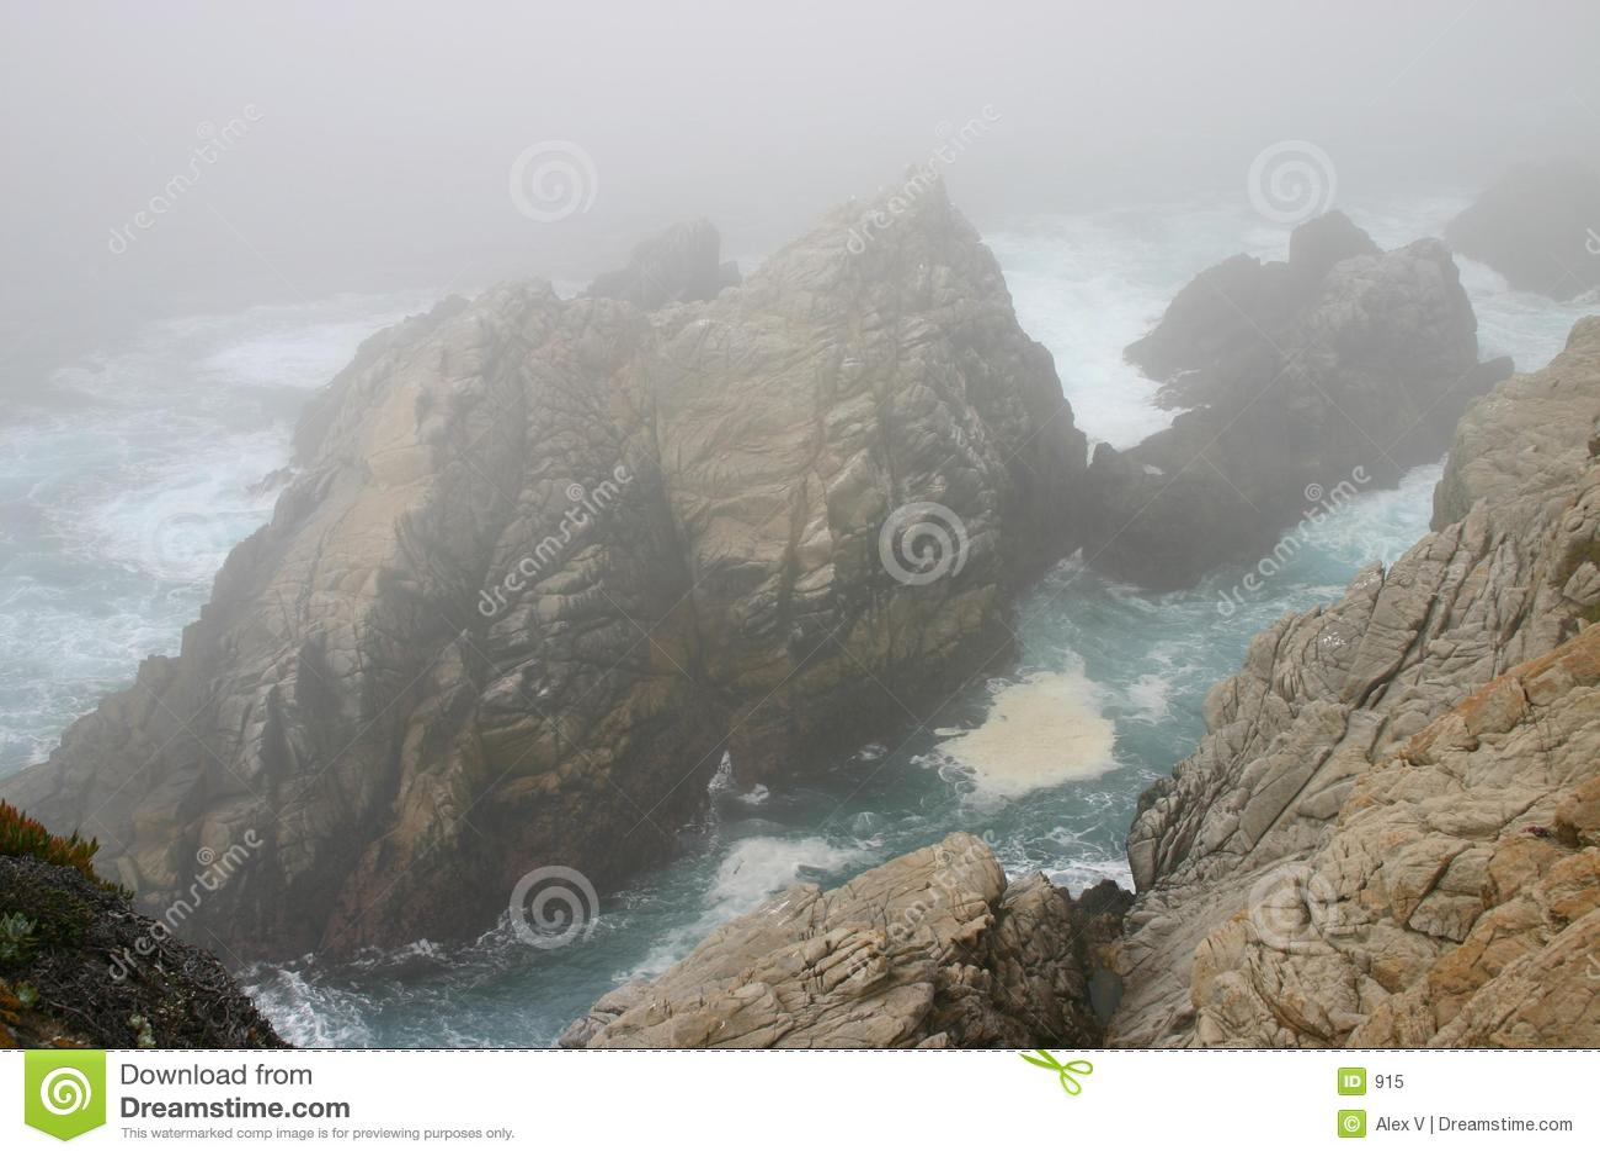 Rocks, fog, and the blue ocean